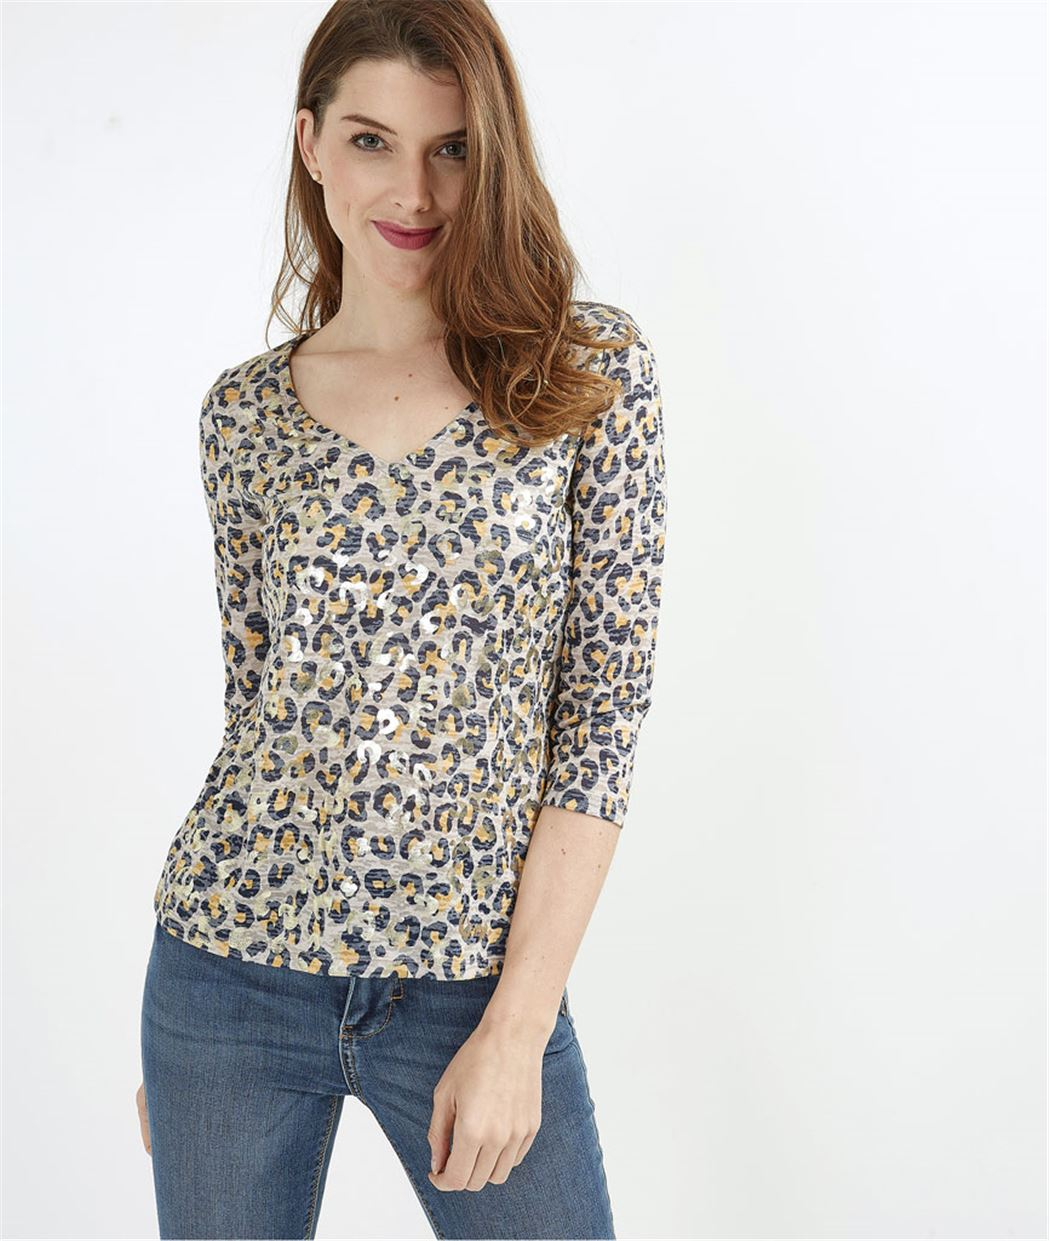 T-shirt femme léopard brillant BEIGE